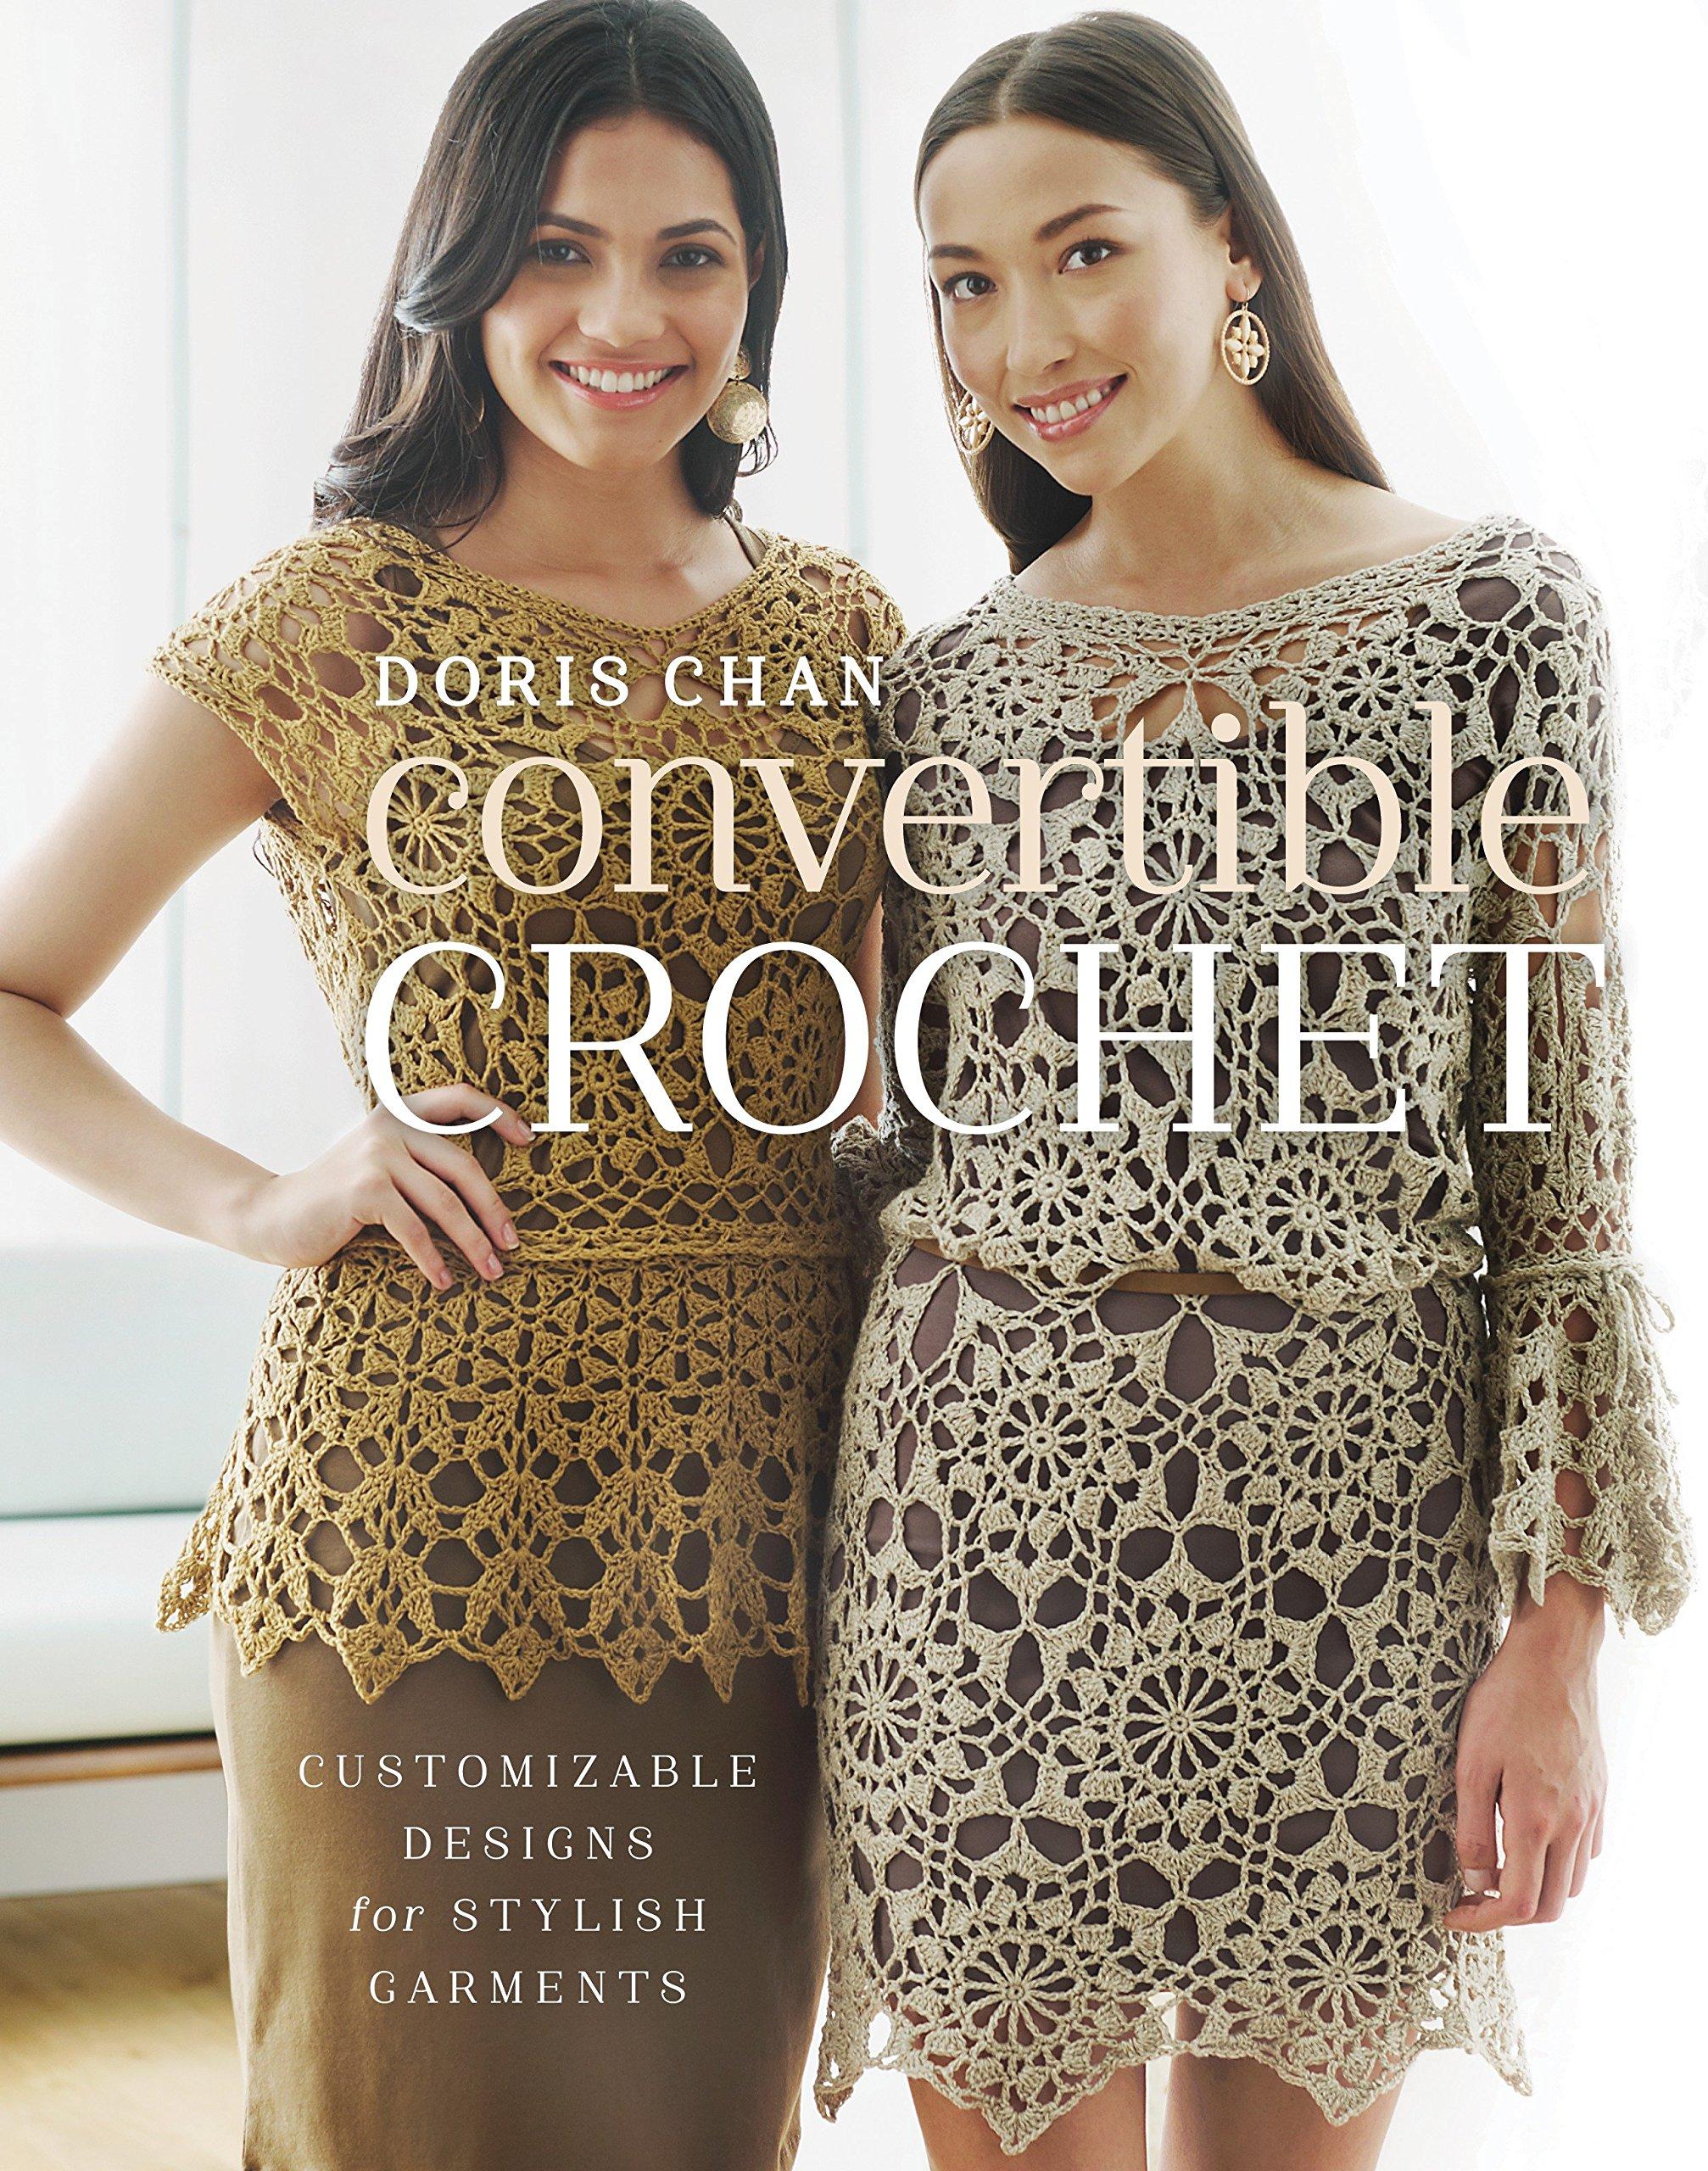 Convertible Crochet: Customizable Designs for Stylish Garments